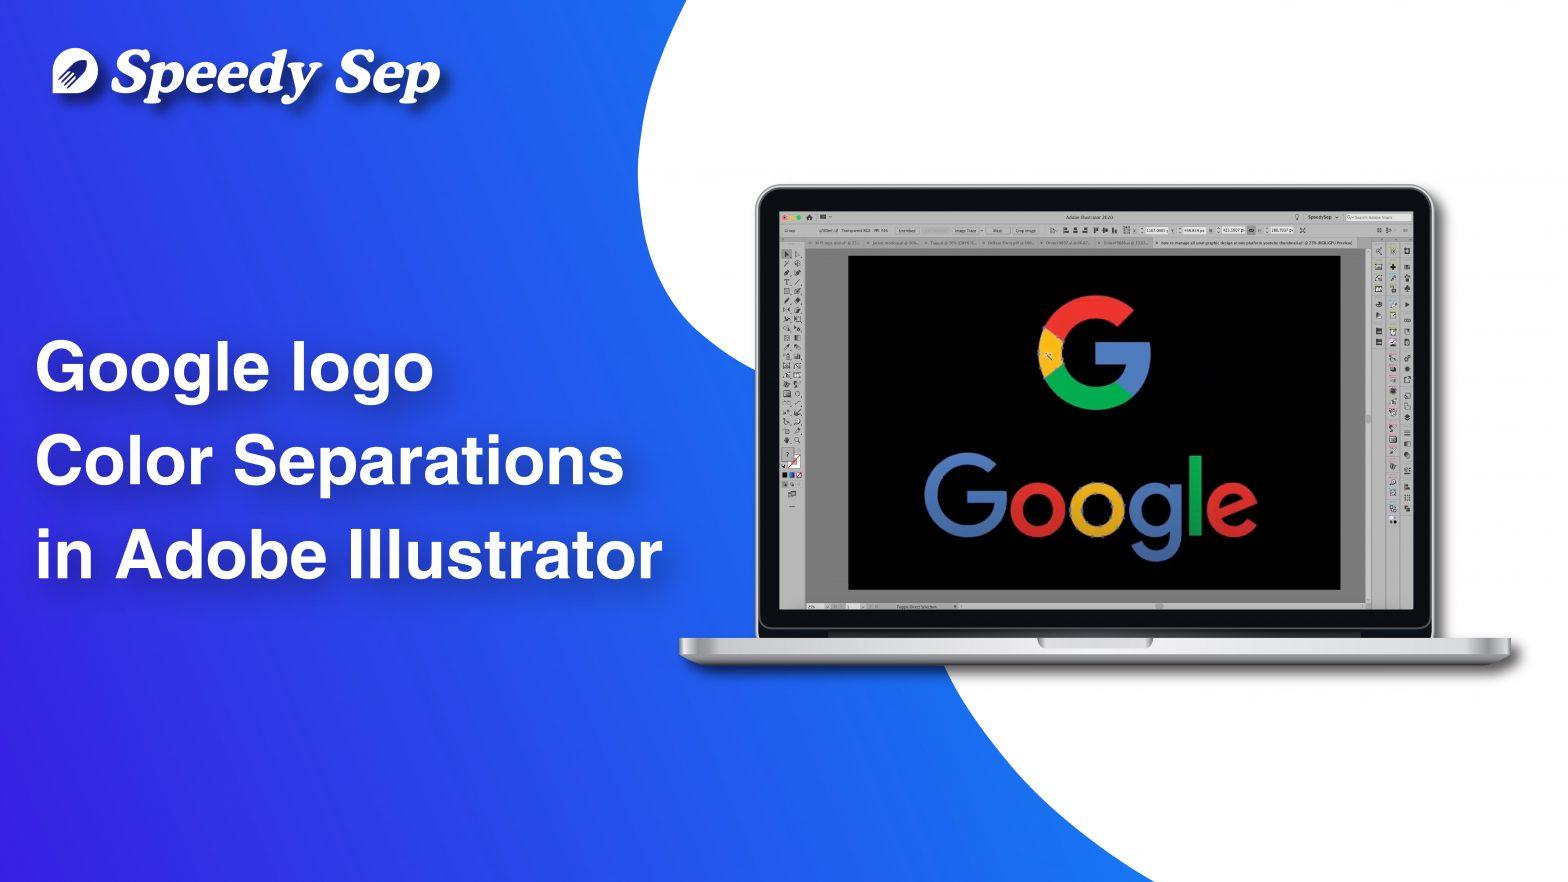 Google Logo in Color Separations in Adobe Illustrator [Step by Step]